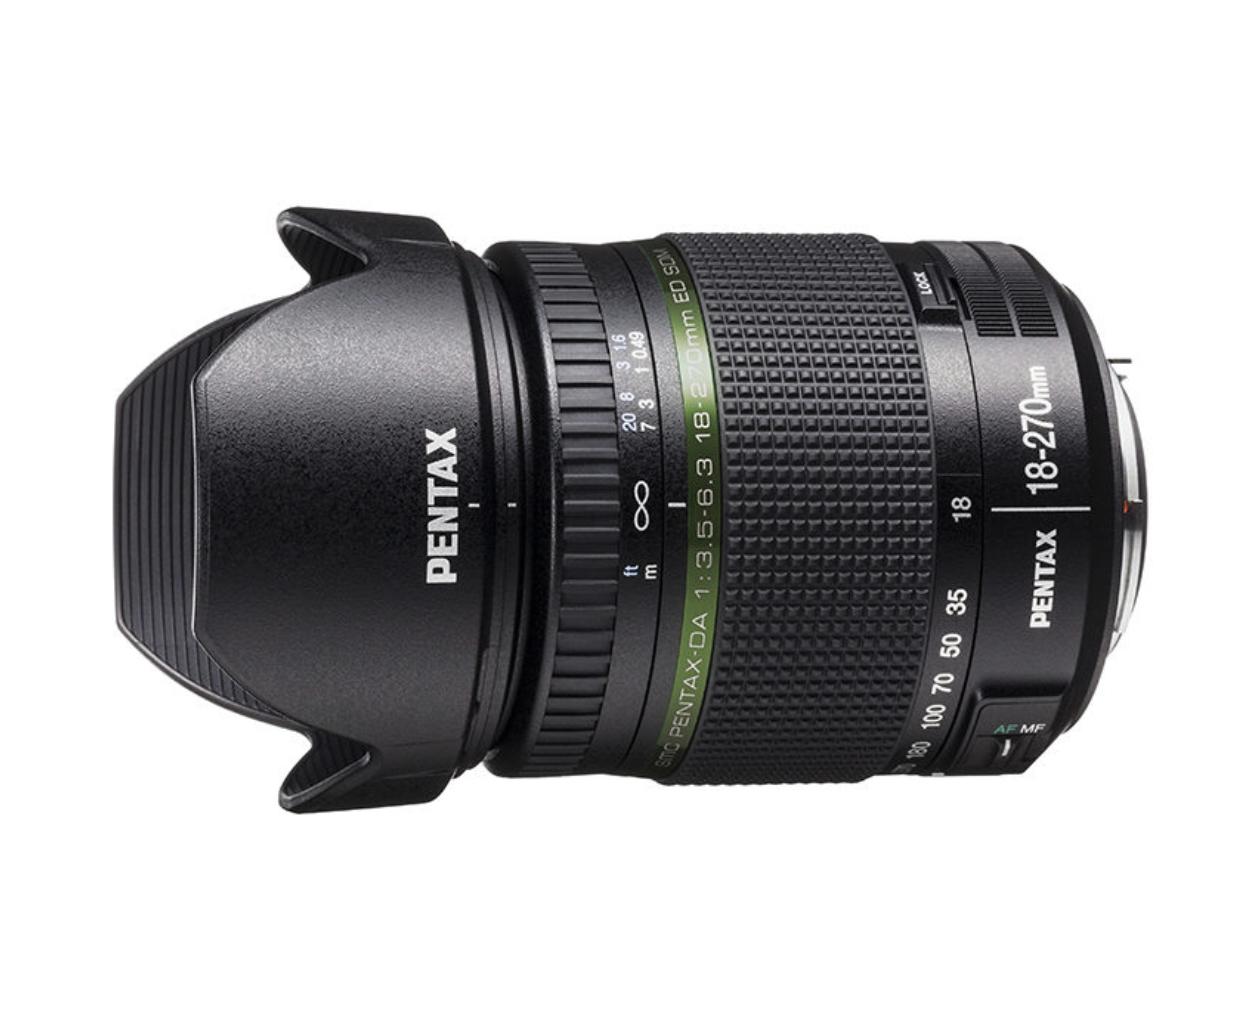 Pentax DA 18-270mm f/3.5-6.3 SDM K-mount